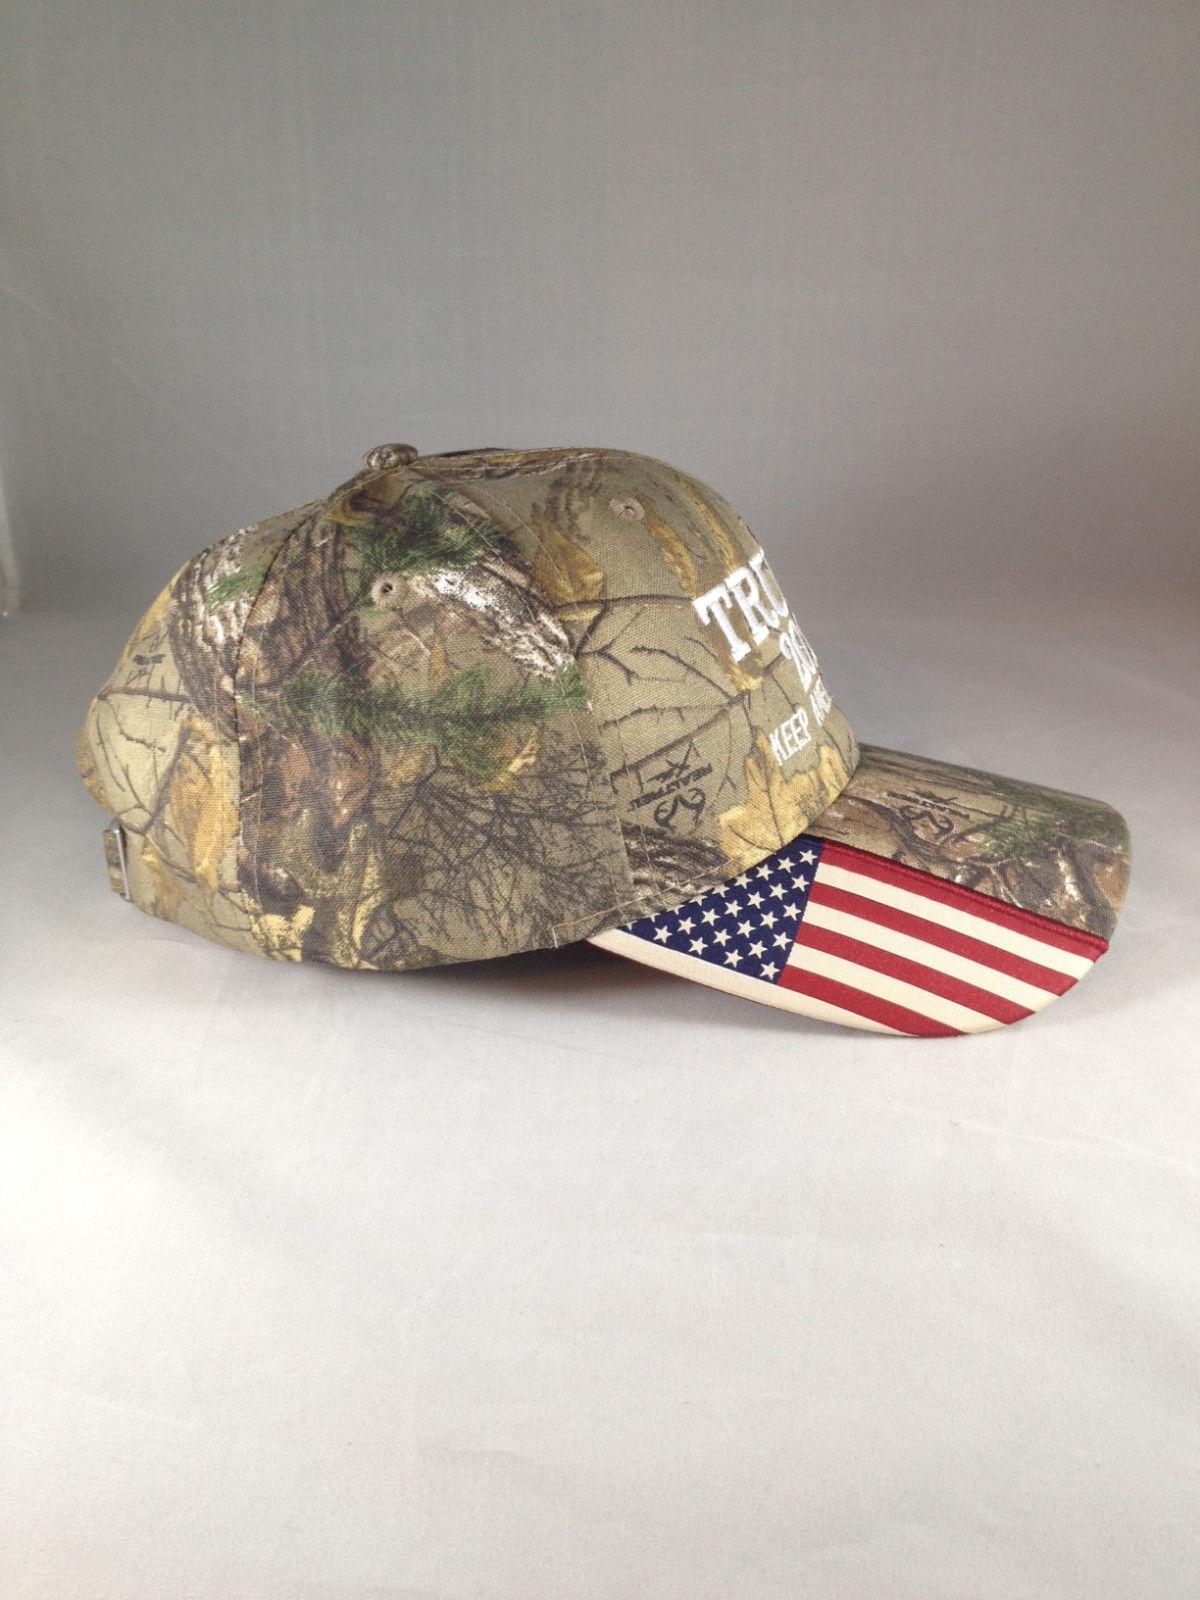 Trump 2020 American Flag Realtree Xtra Hat Keep America Great MAGA USA Camo Cap